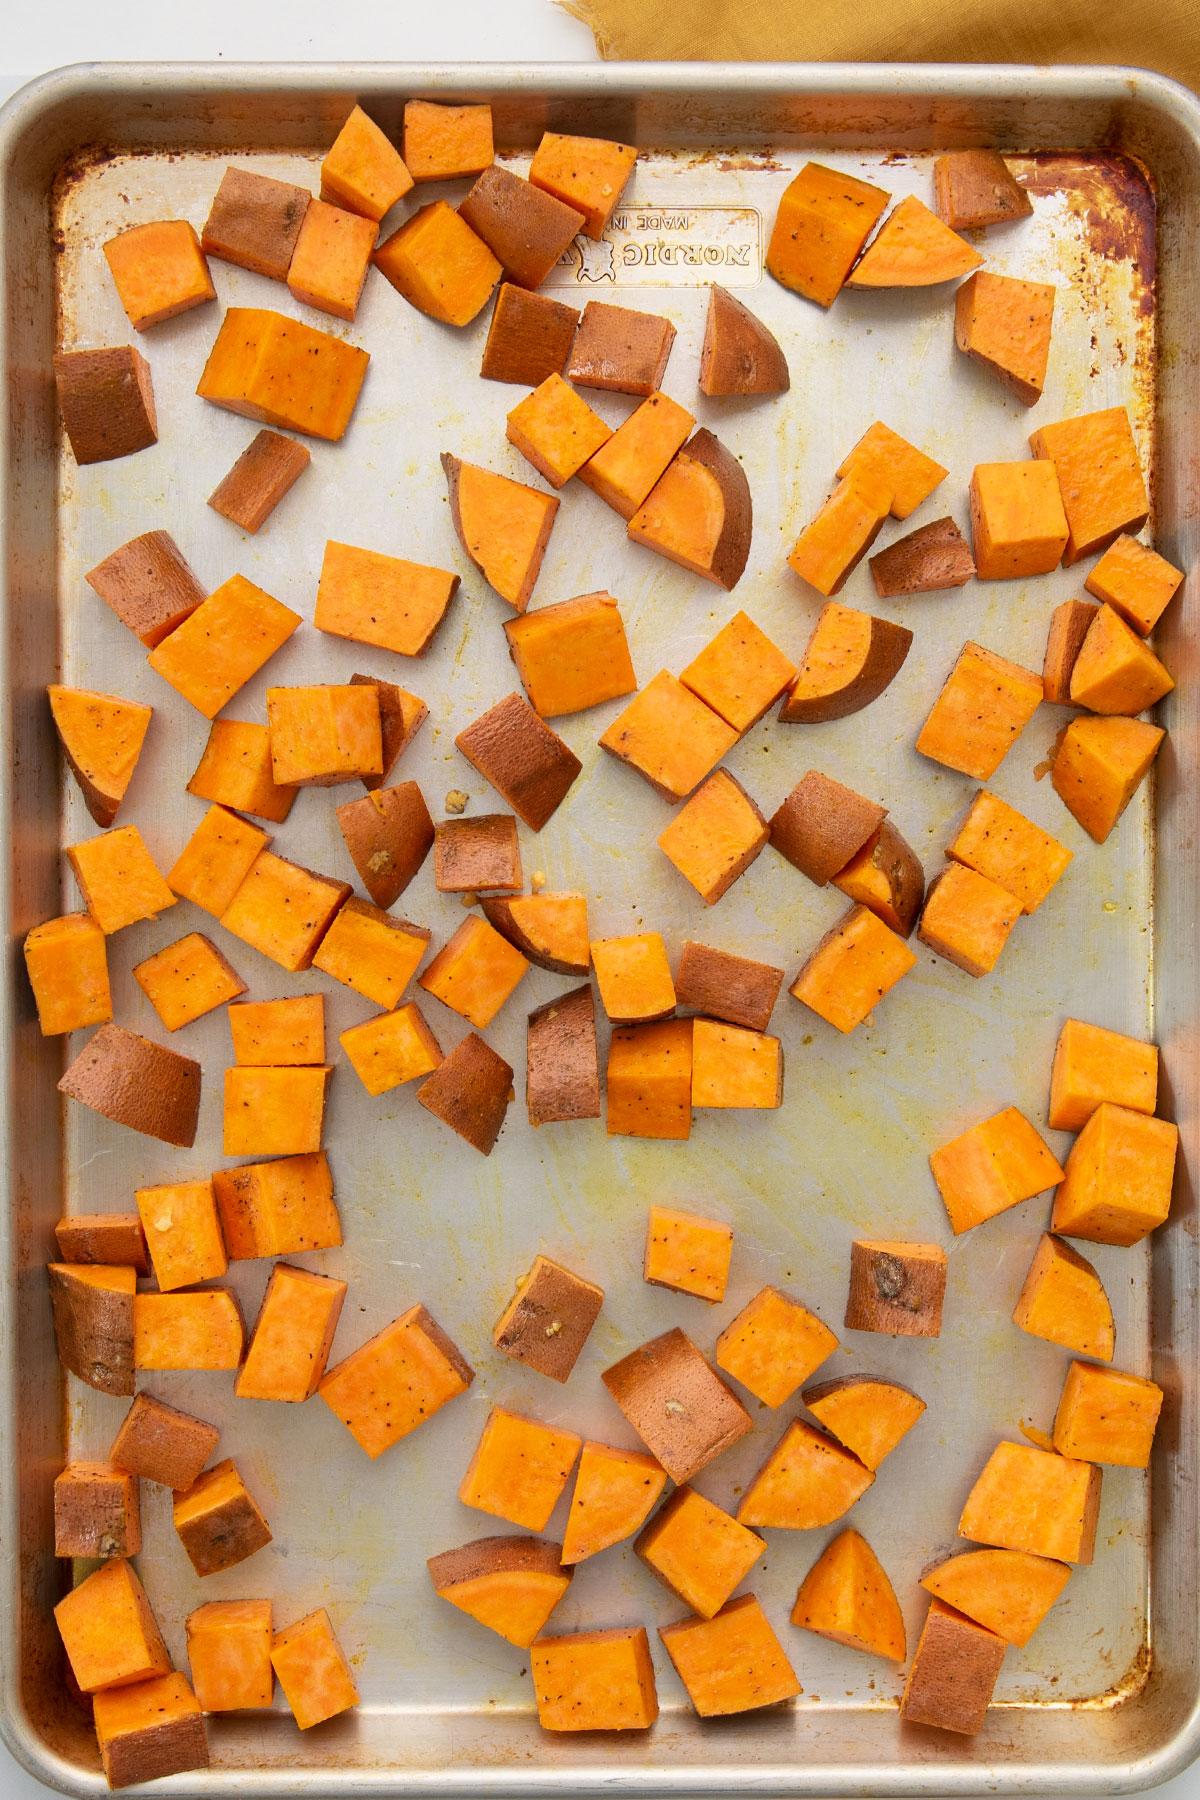 chunks of sweet potatoes on a baking sheet